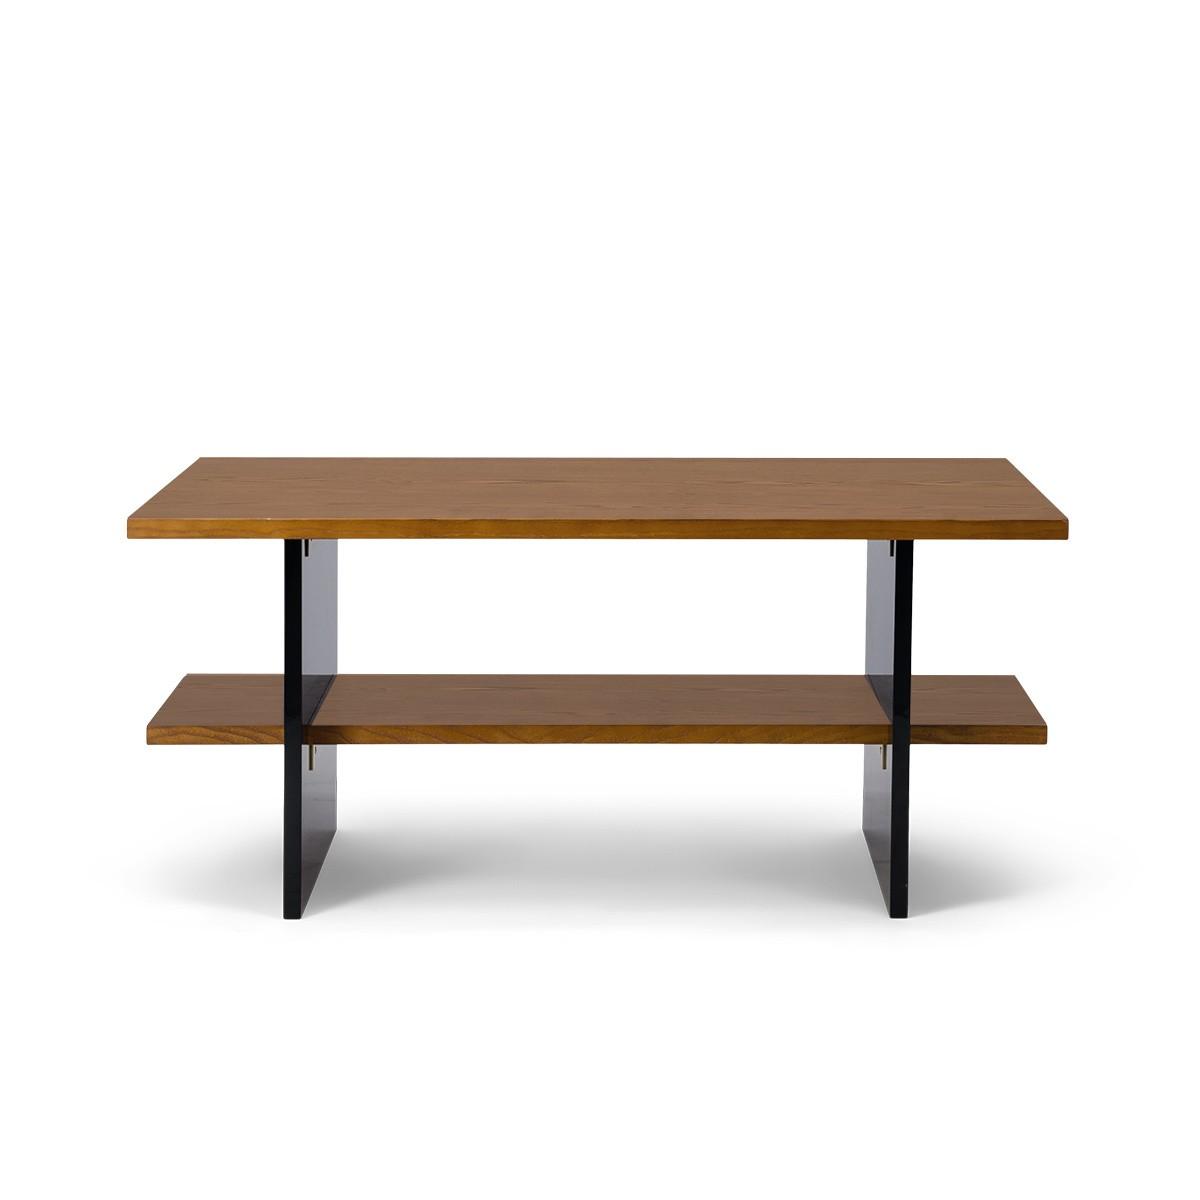 Table basse Orso finition iroko